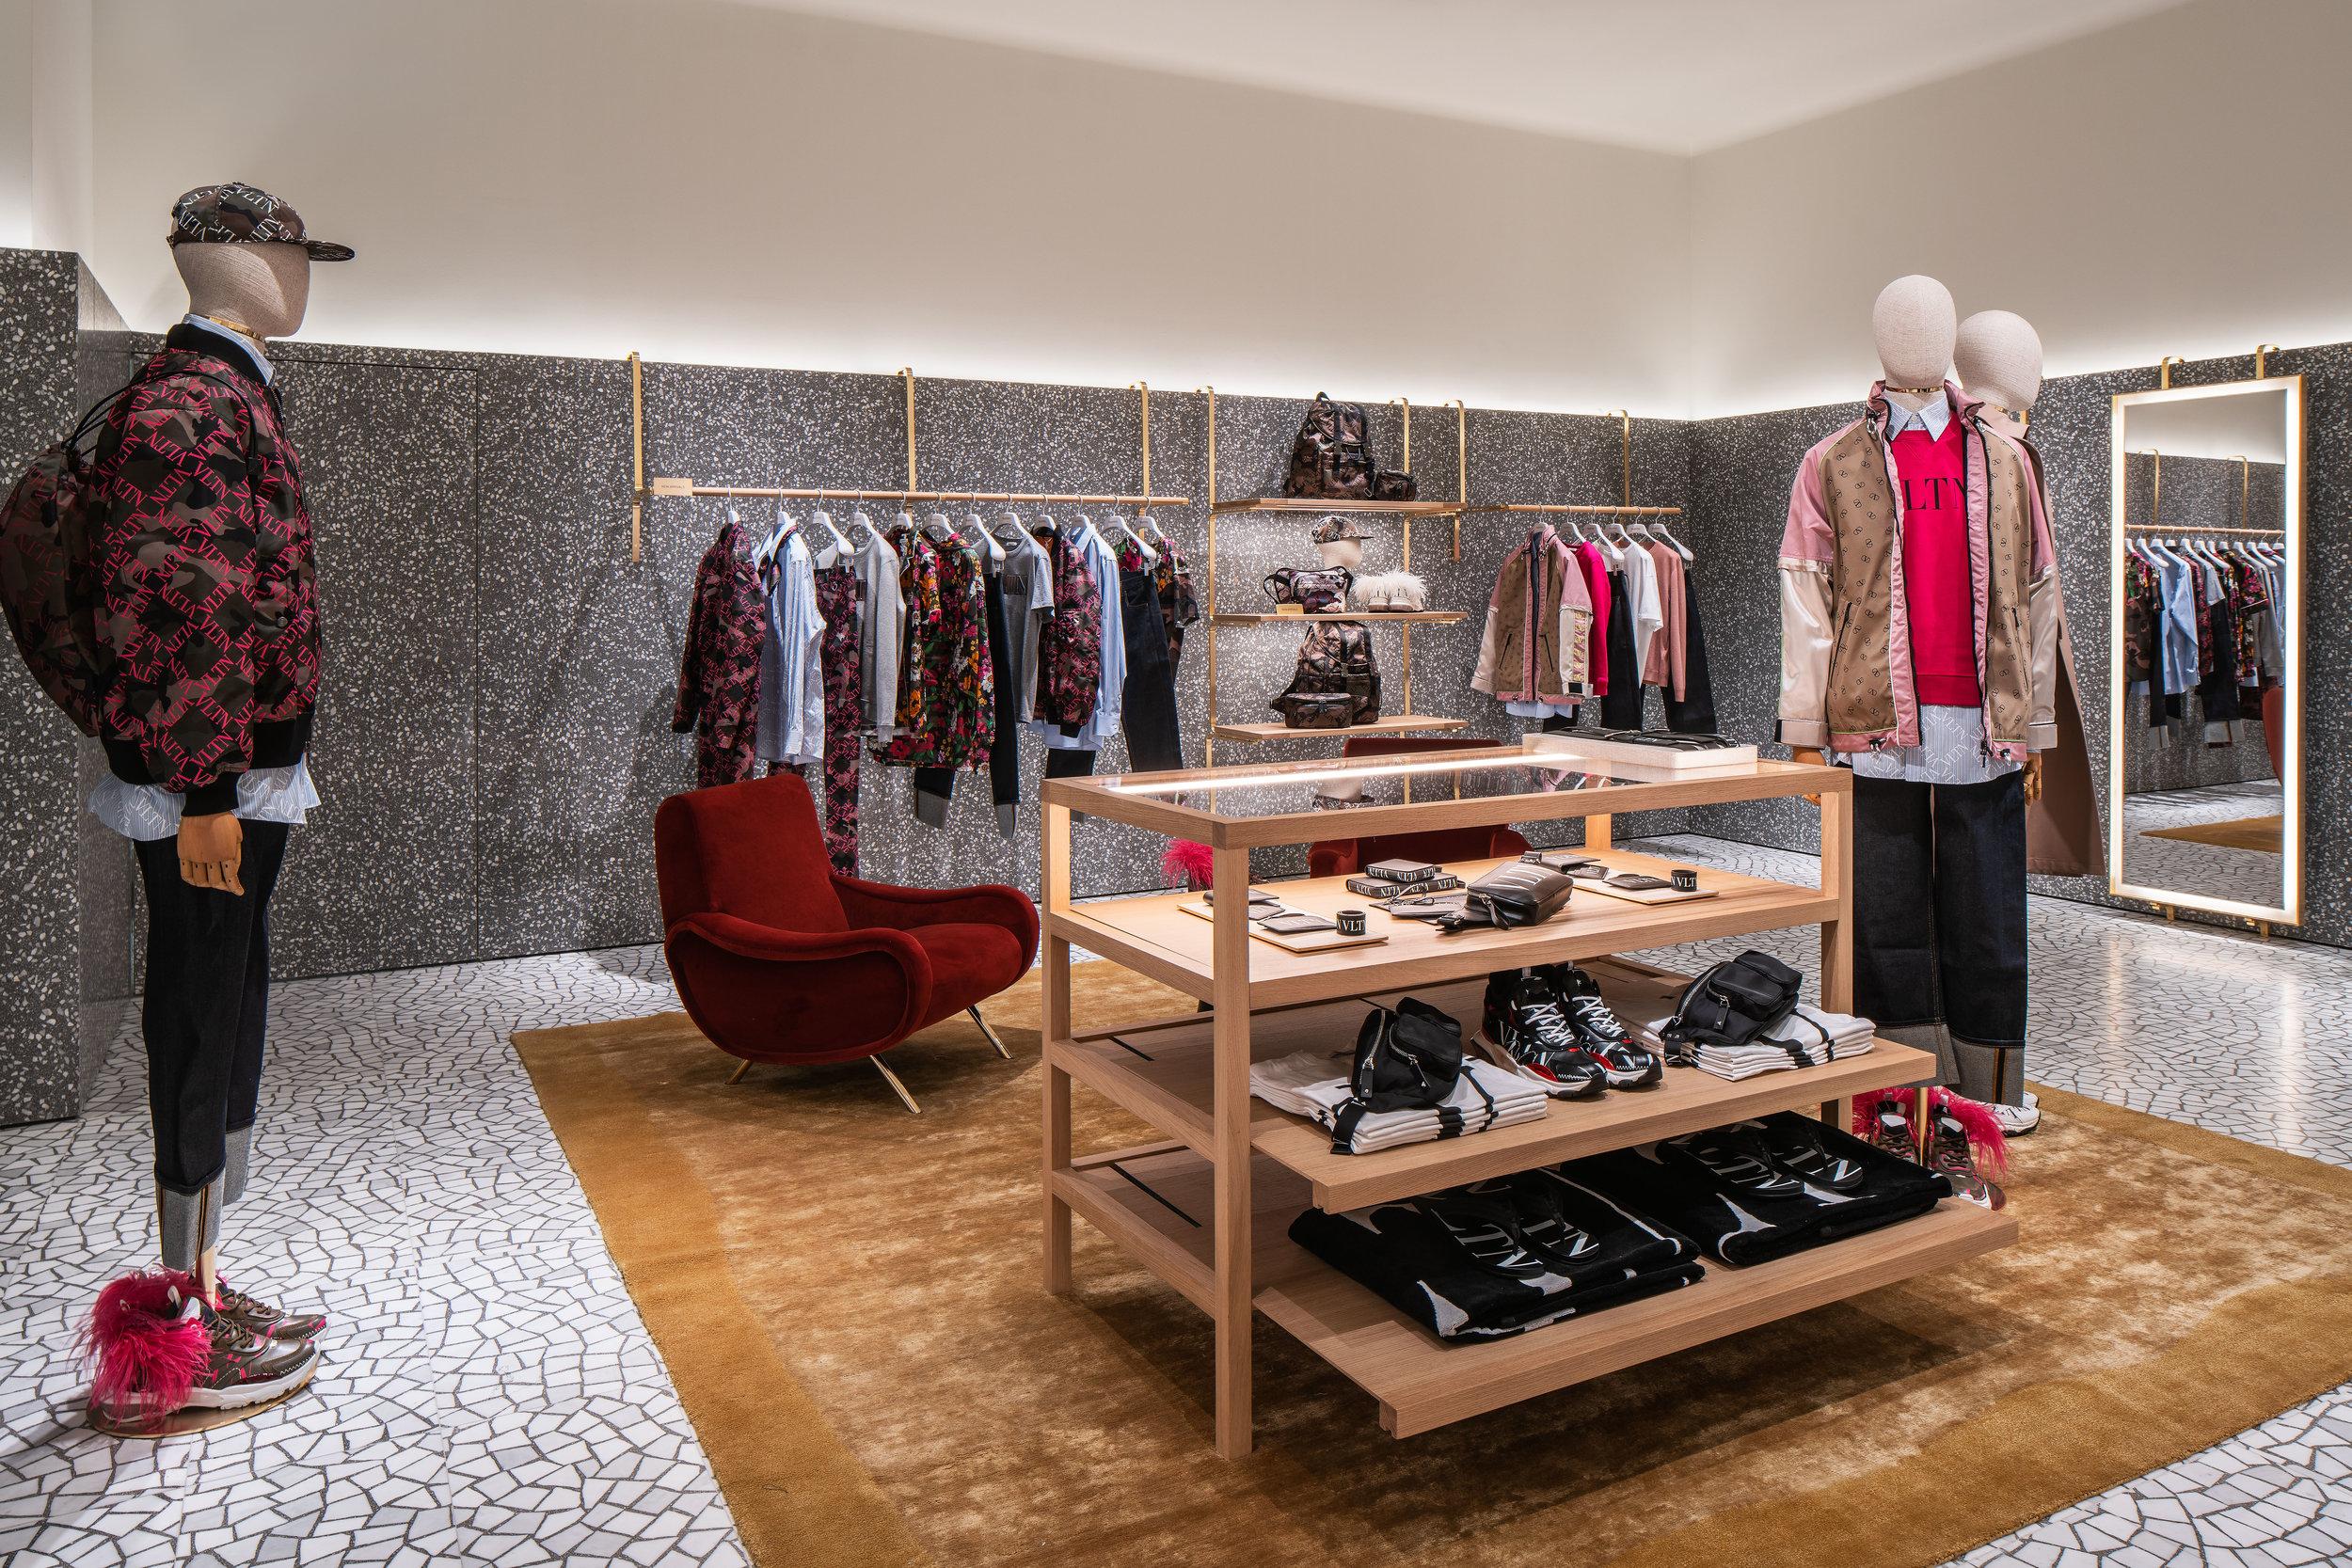 Valentino at Toronto's Yorkdale Shopping centre. photo: michael muraz